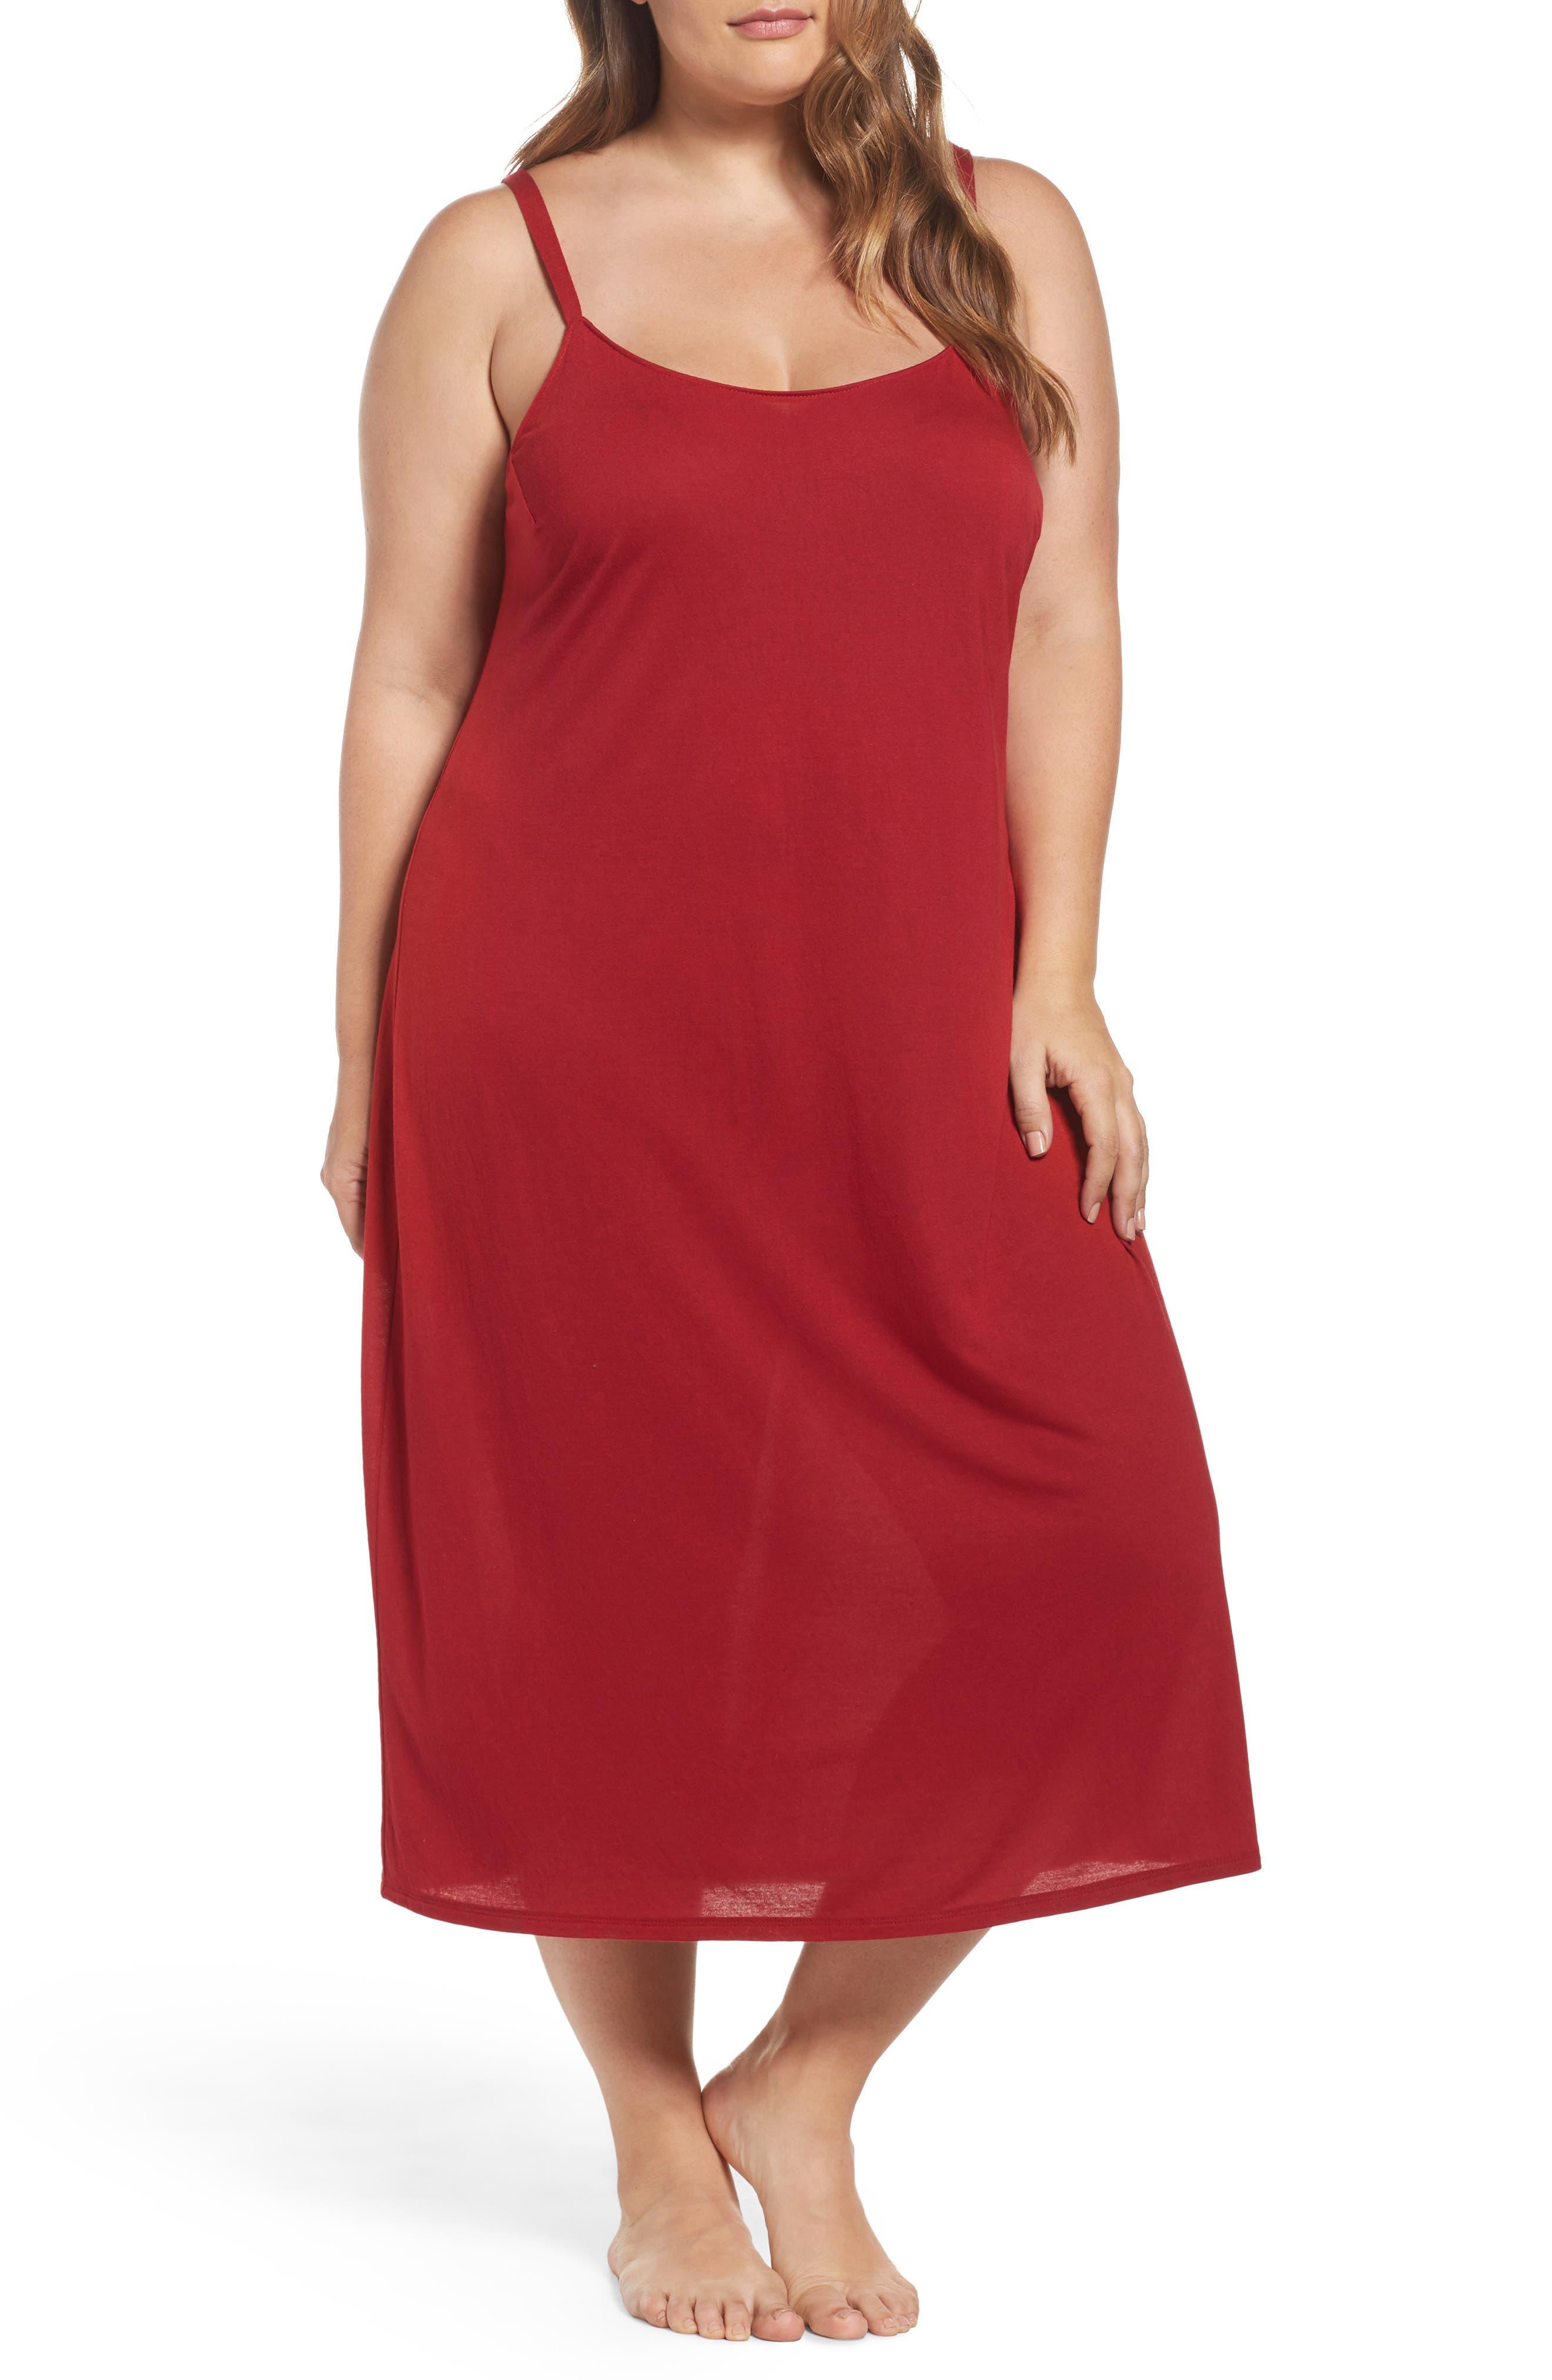 'Shangri La' Nightgown,                             Main thumbnail 1, color,                             Crimson Red